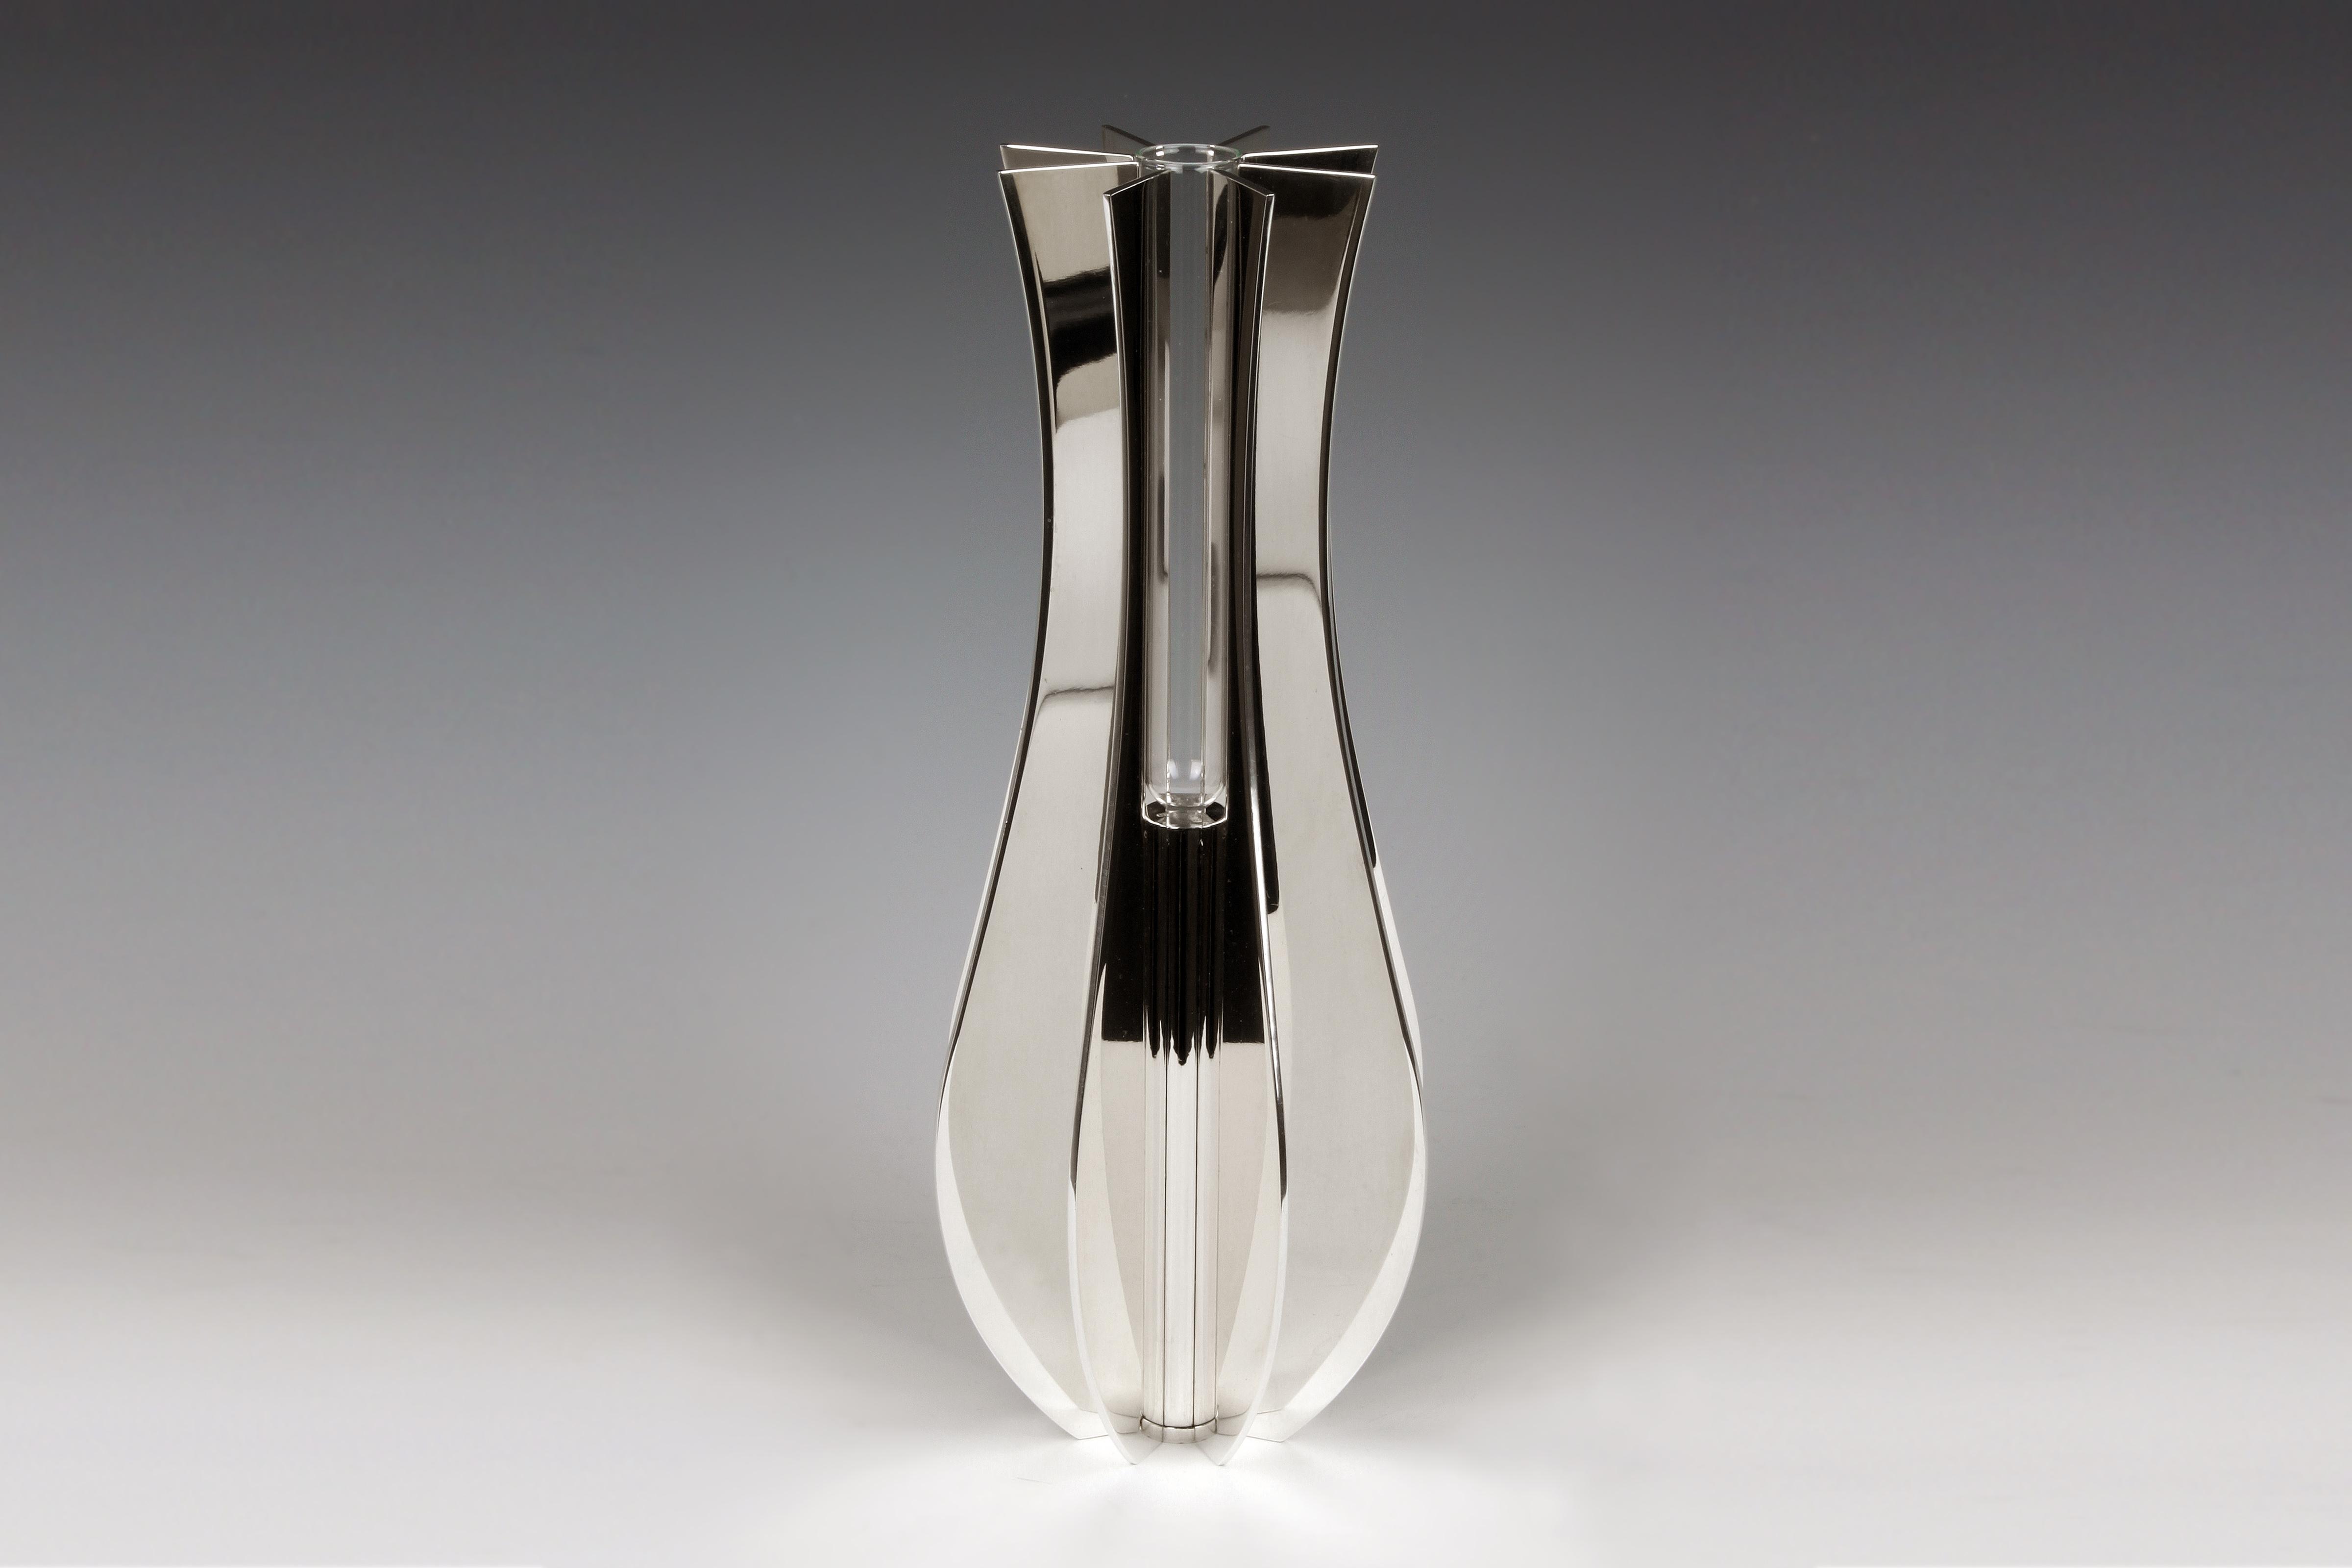 Template Vase Shiny – Copyright BJRdesigns